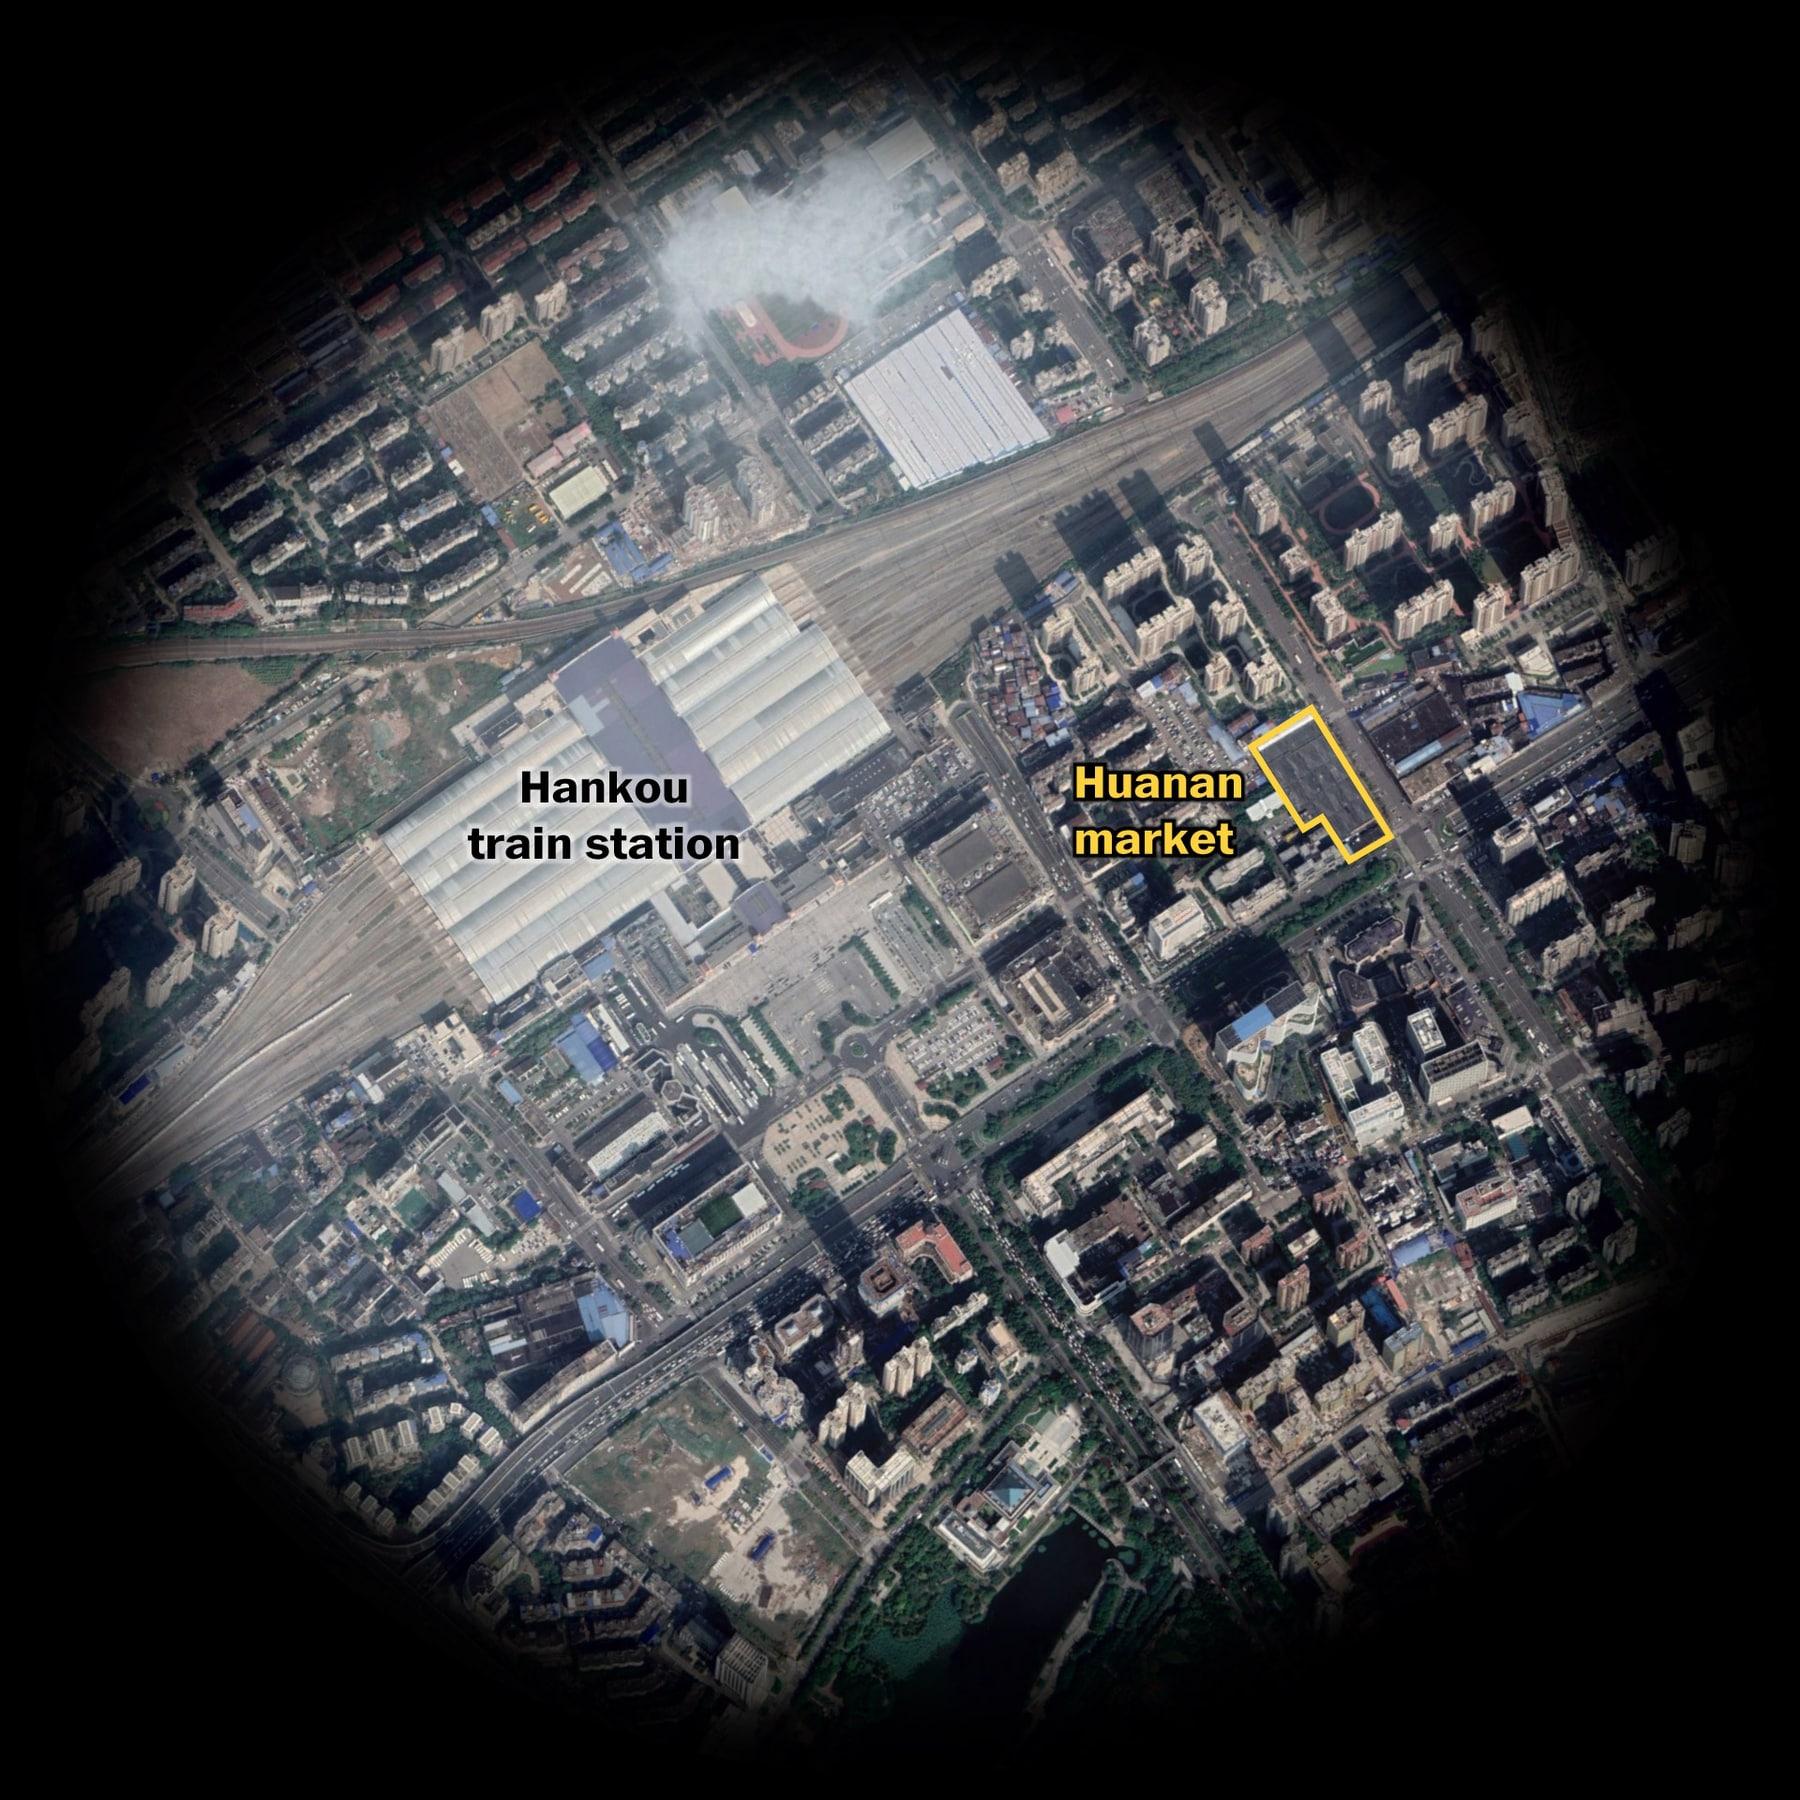 Coronavirus maps show how many people live near Wuhan, China - The ...